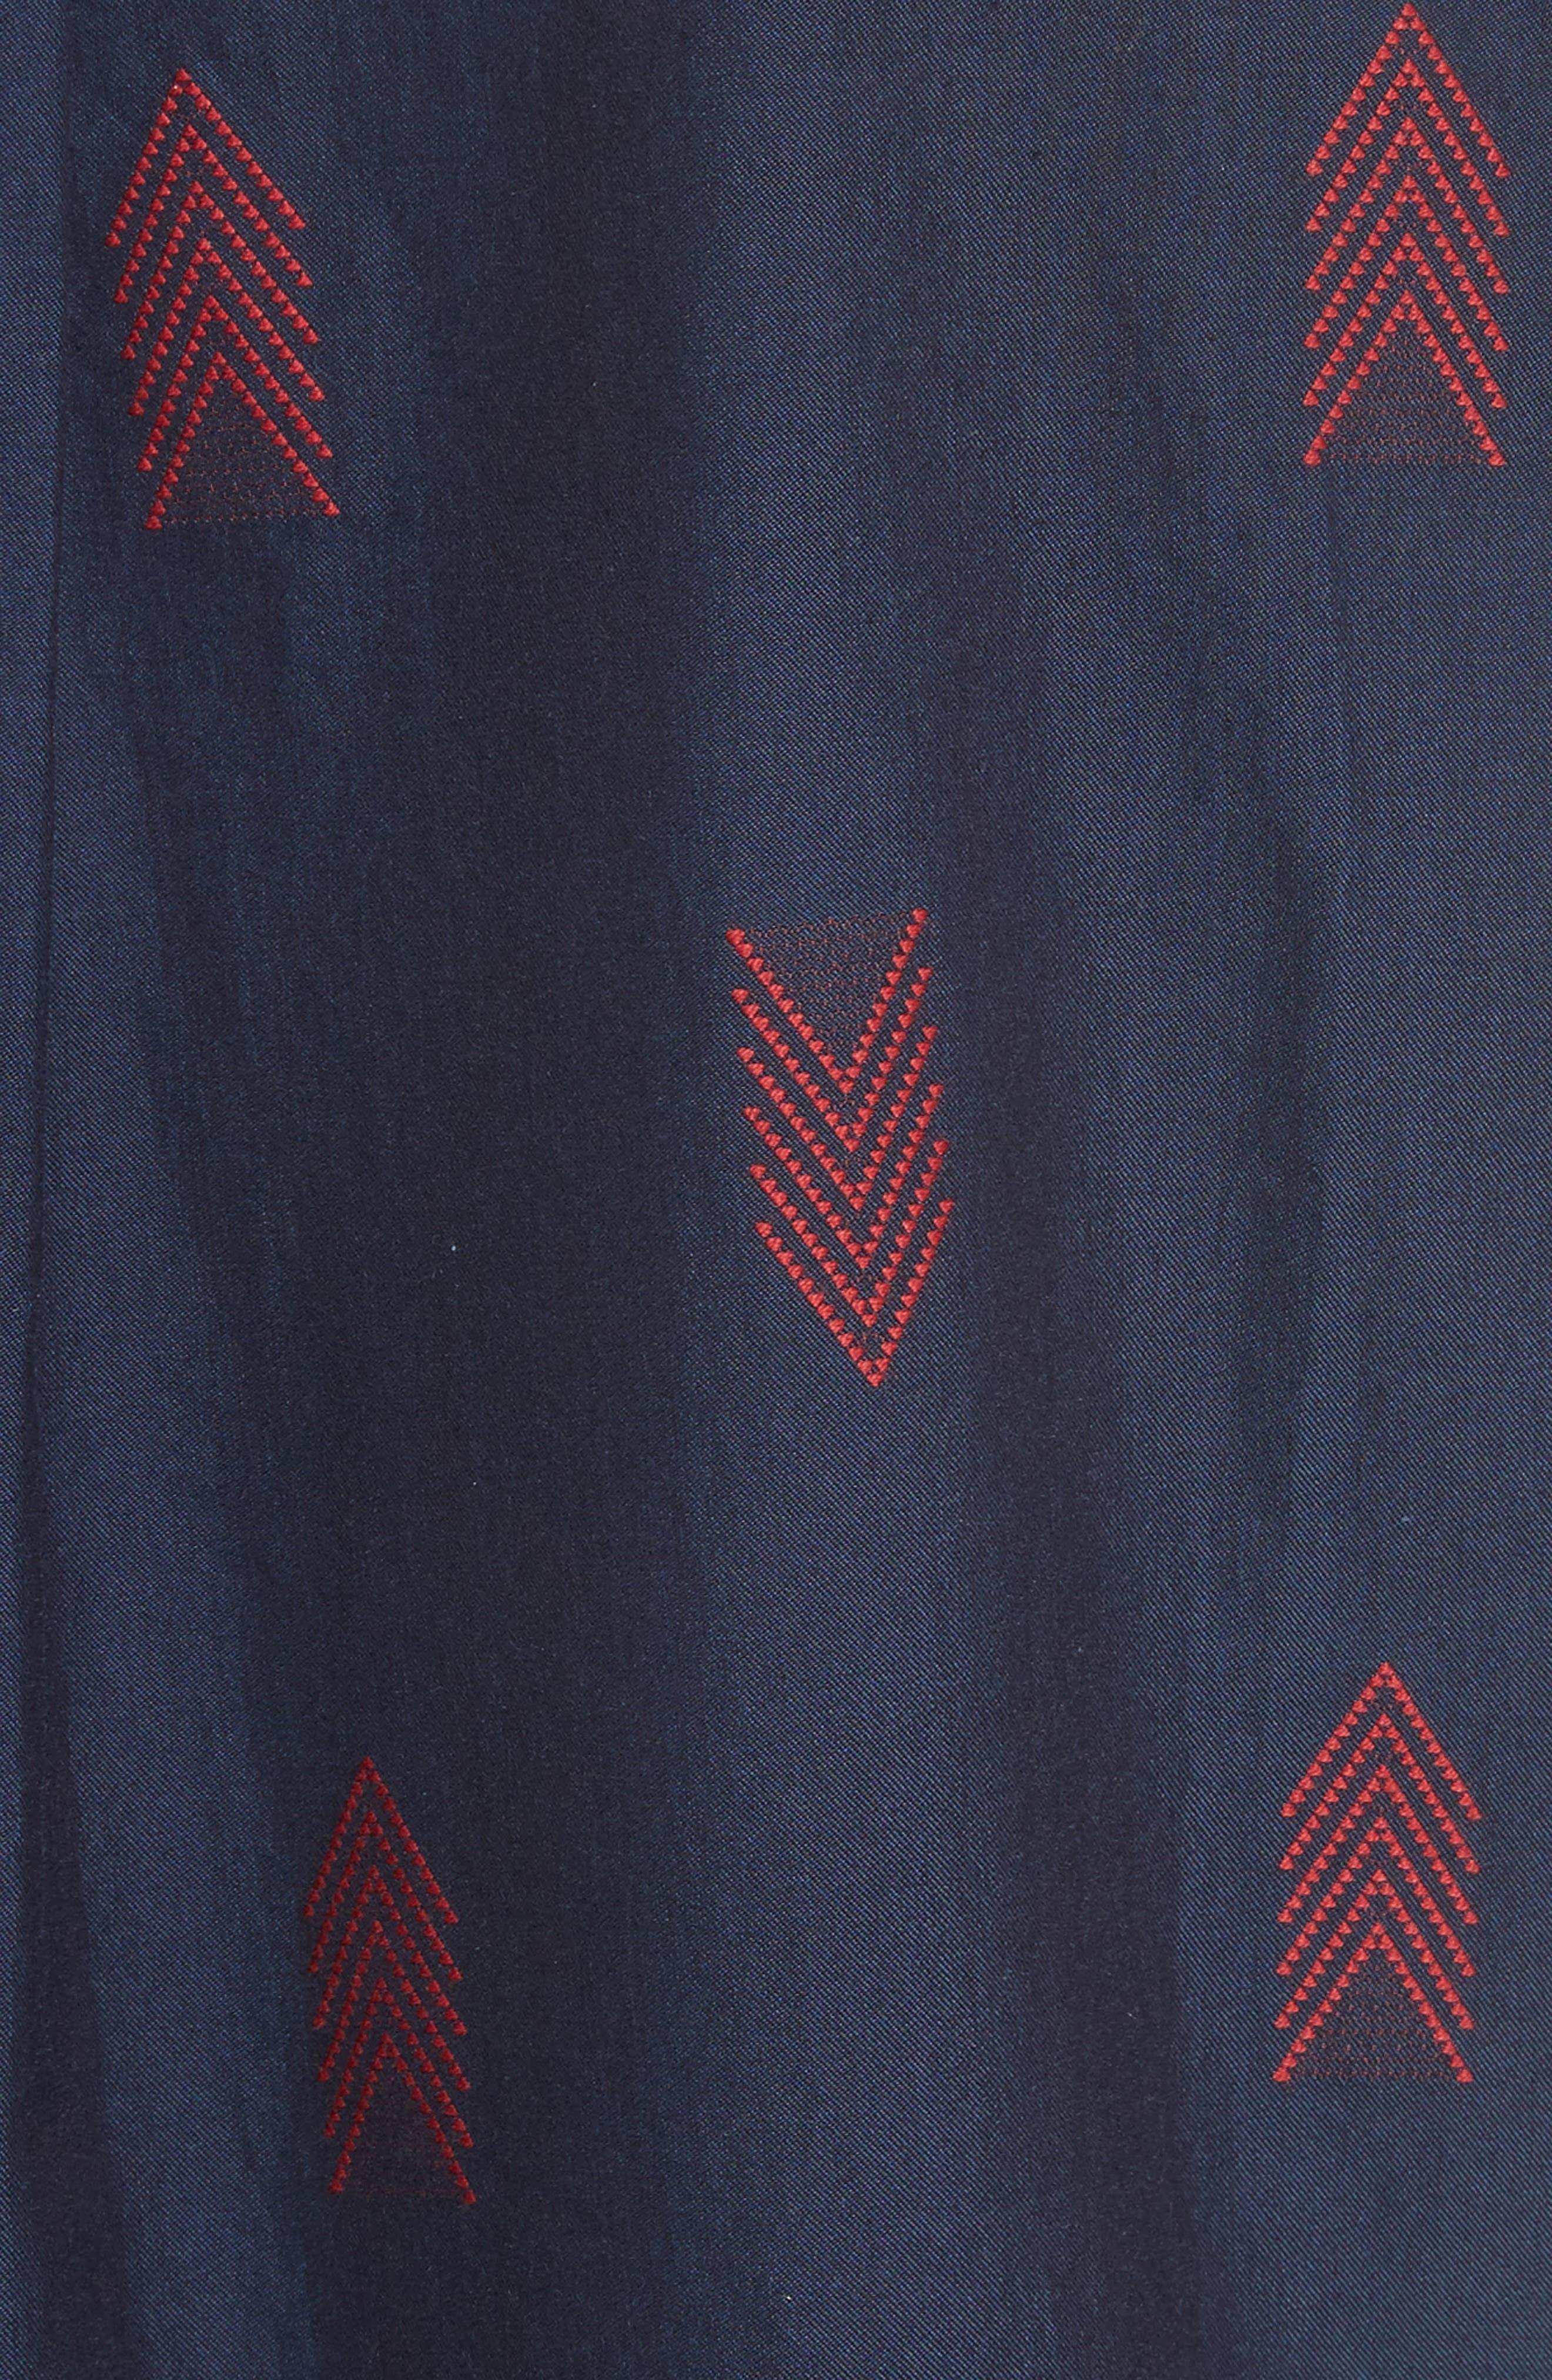 Short Sleeve Woven Shirt,                             Alternate thumbnail 5, color,                             420